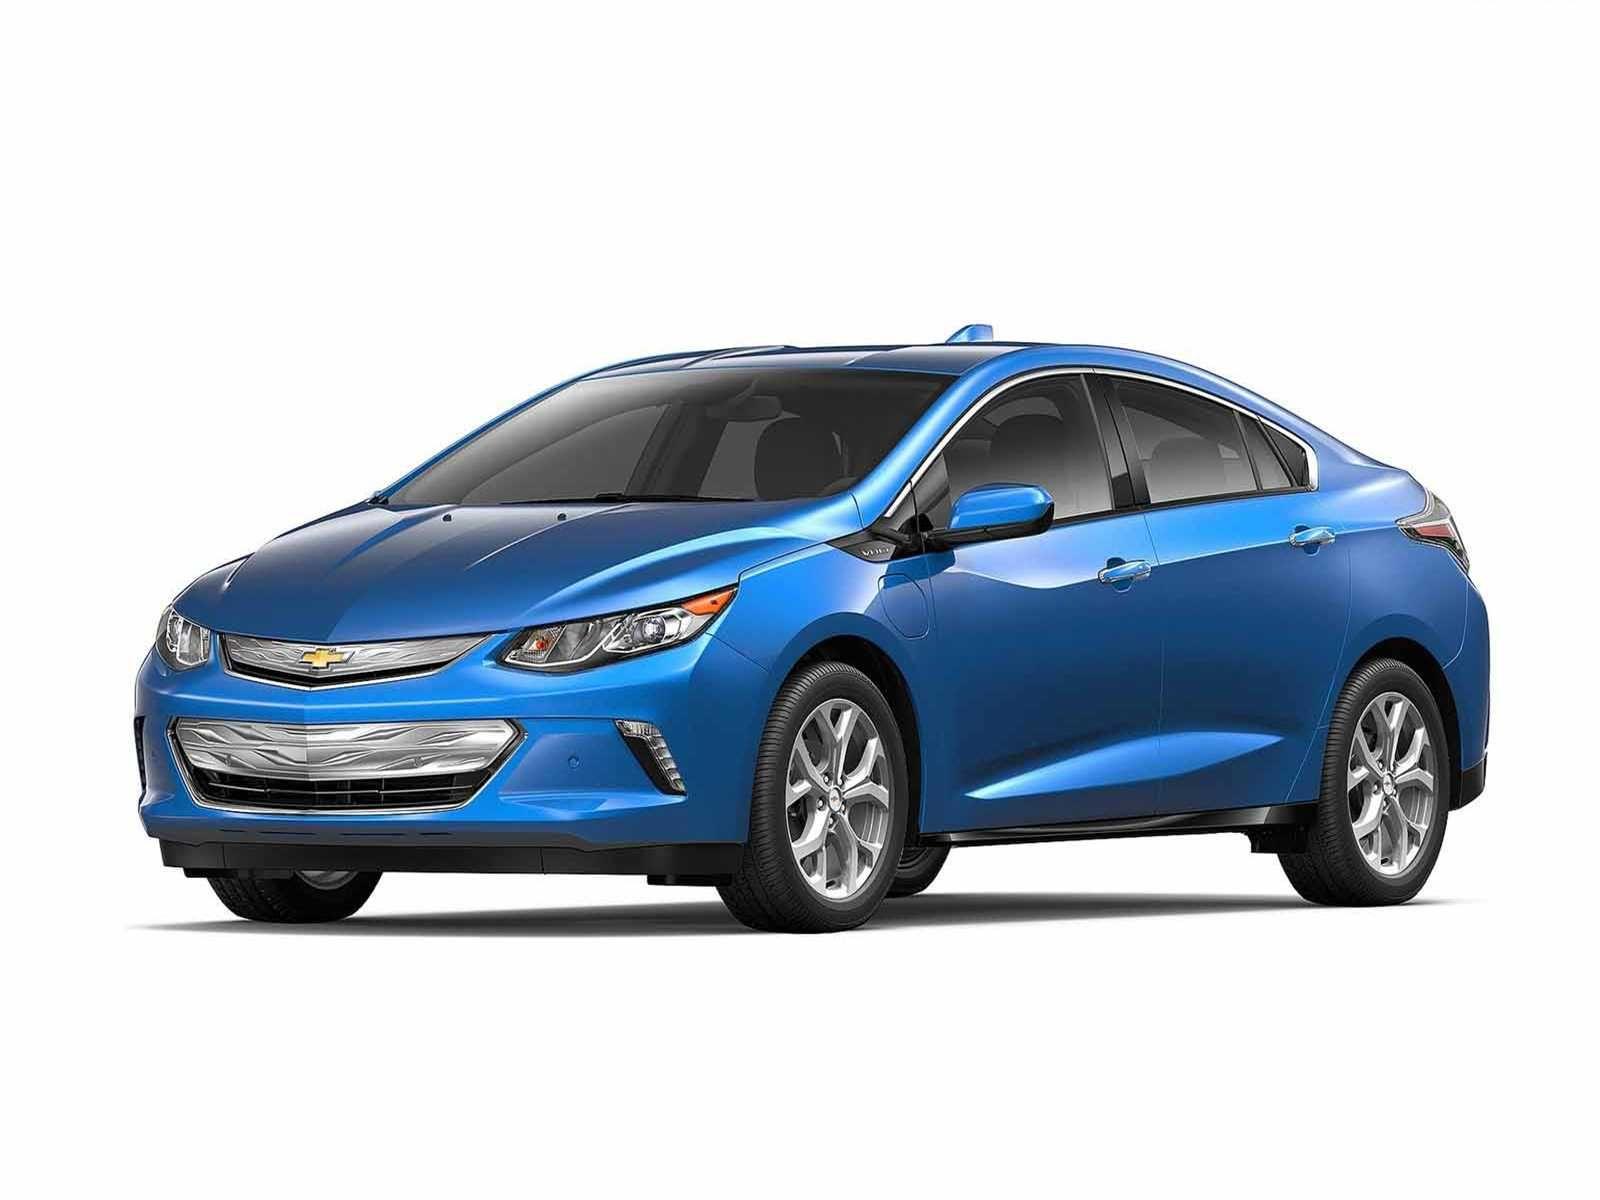 New Chevrolet Volt 2016 Chevrolet volt, Hybrid car